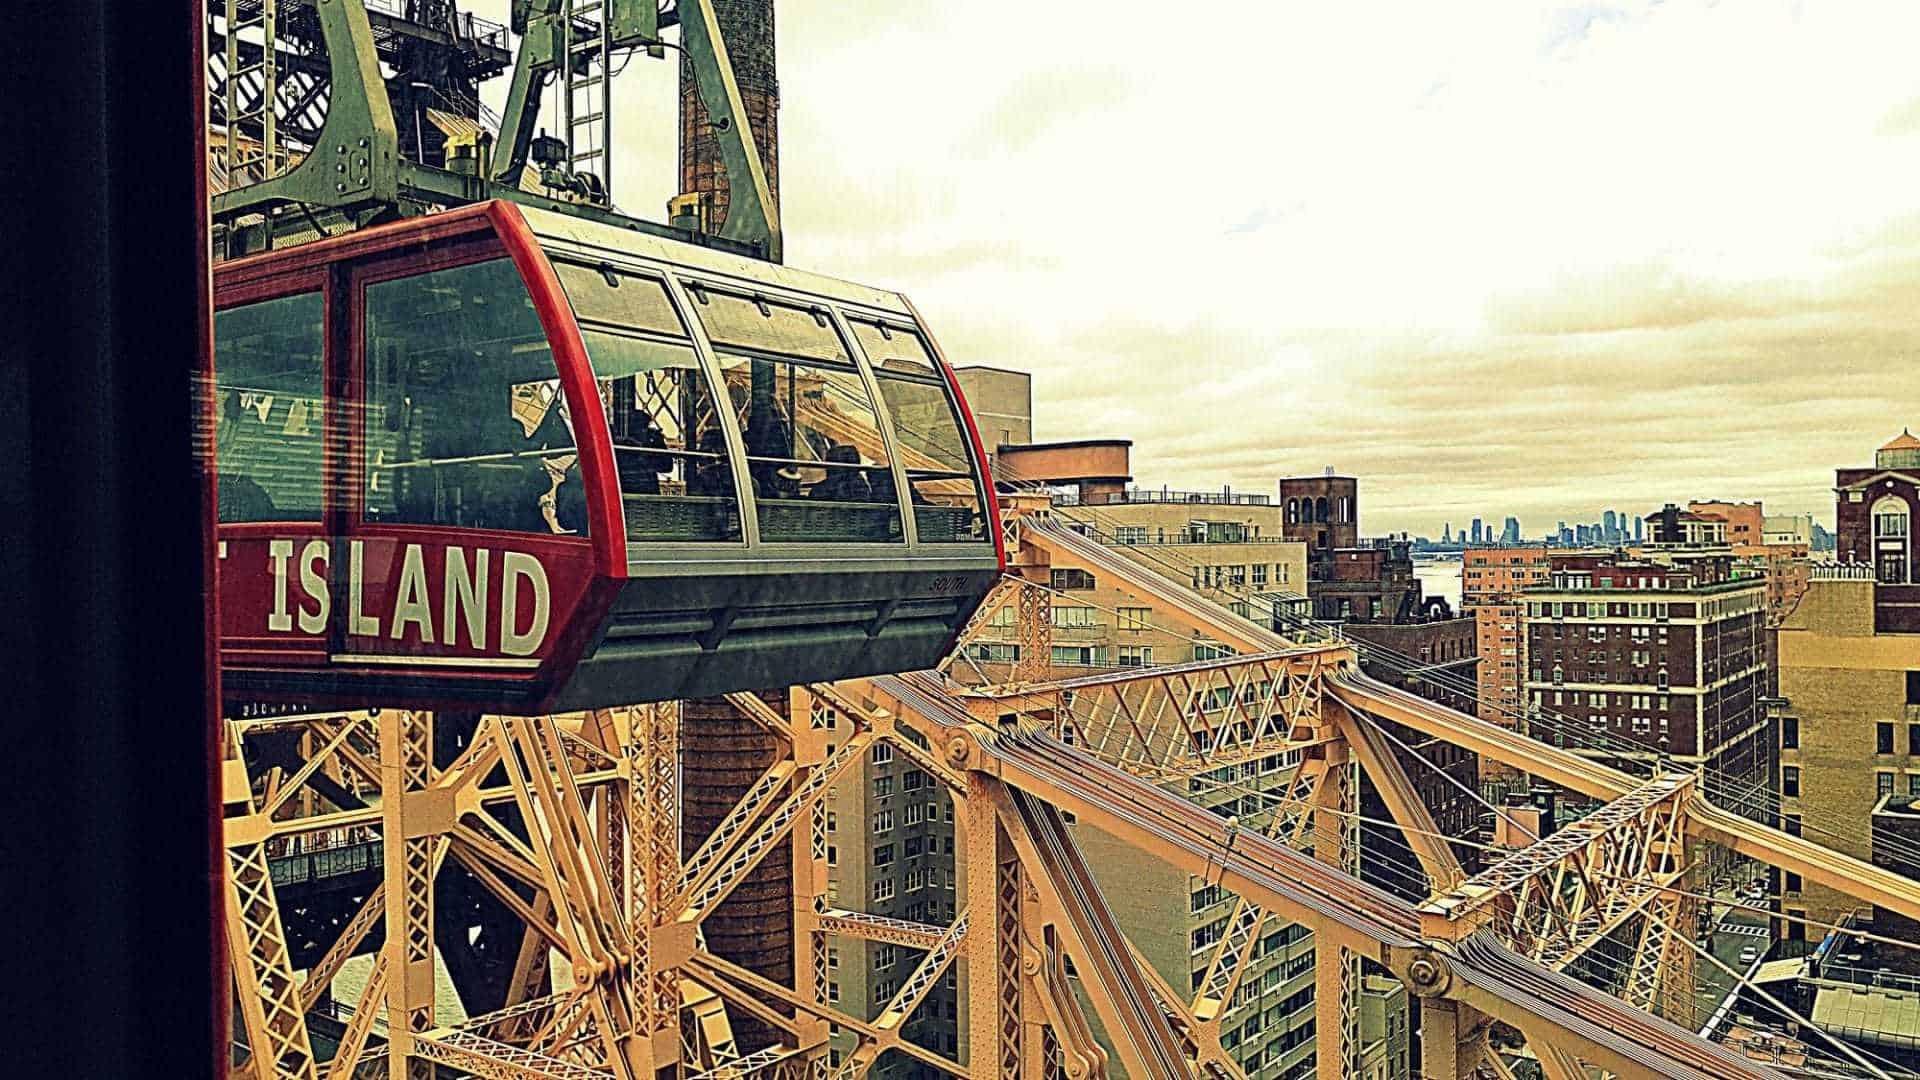 Roosevelt Island Tramway: sorvolando il cielo di New York in funivia